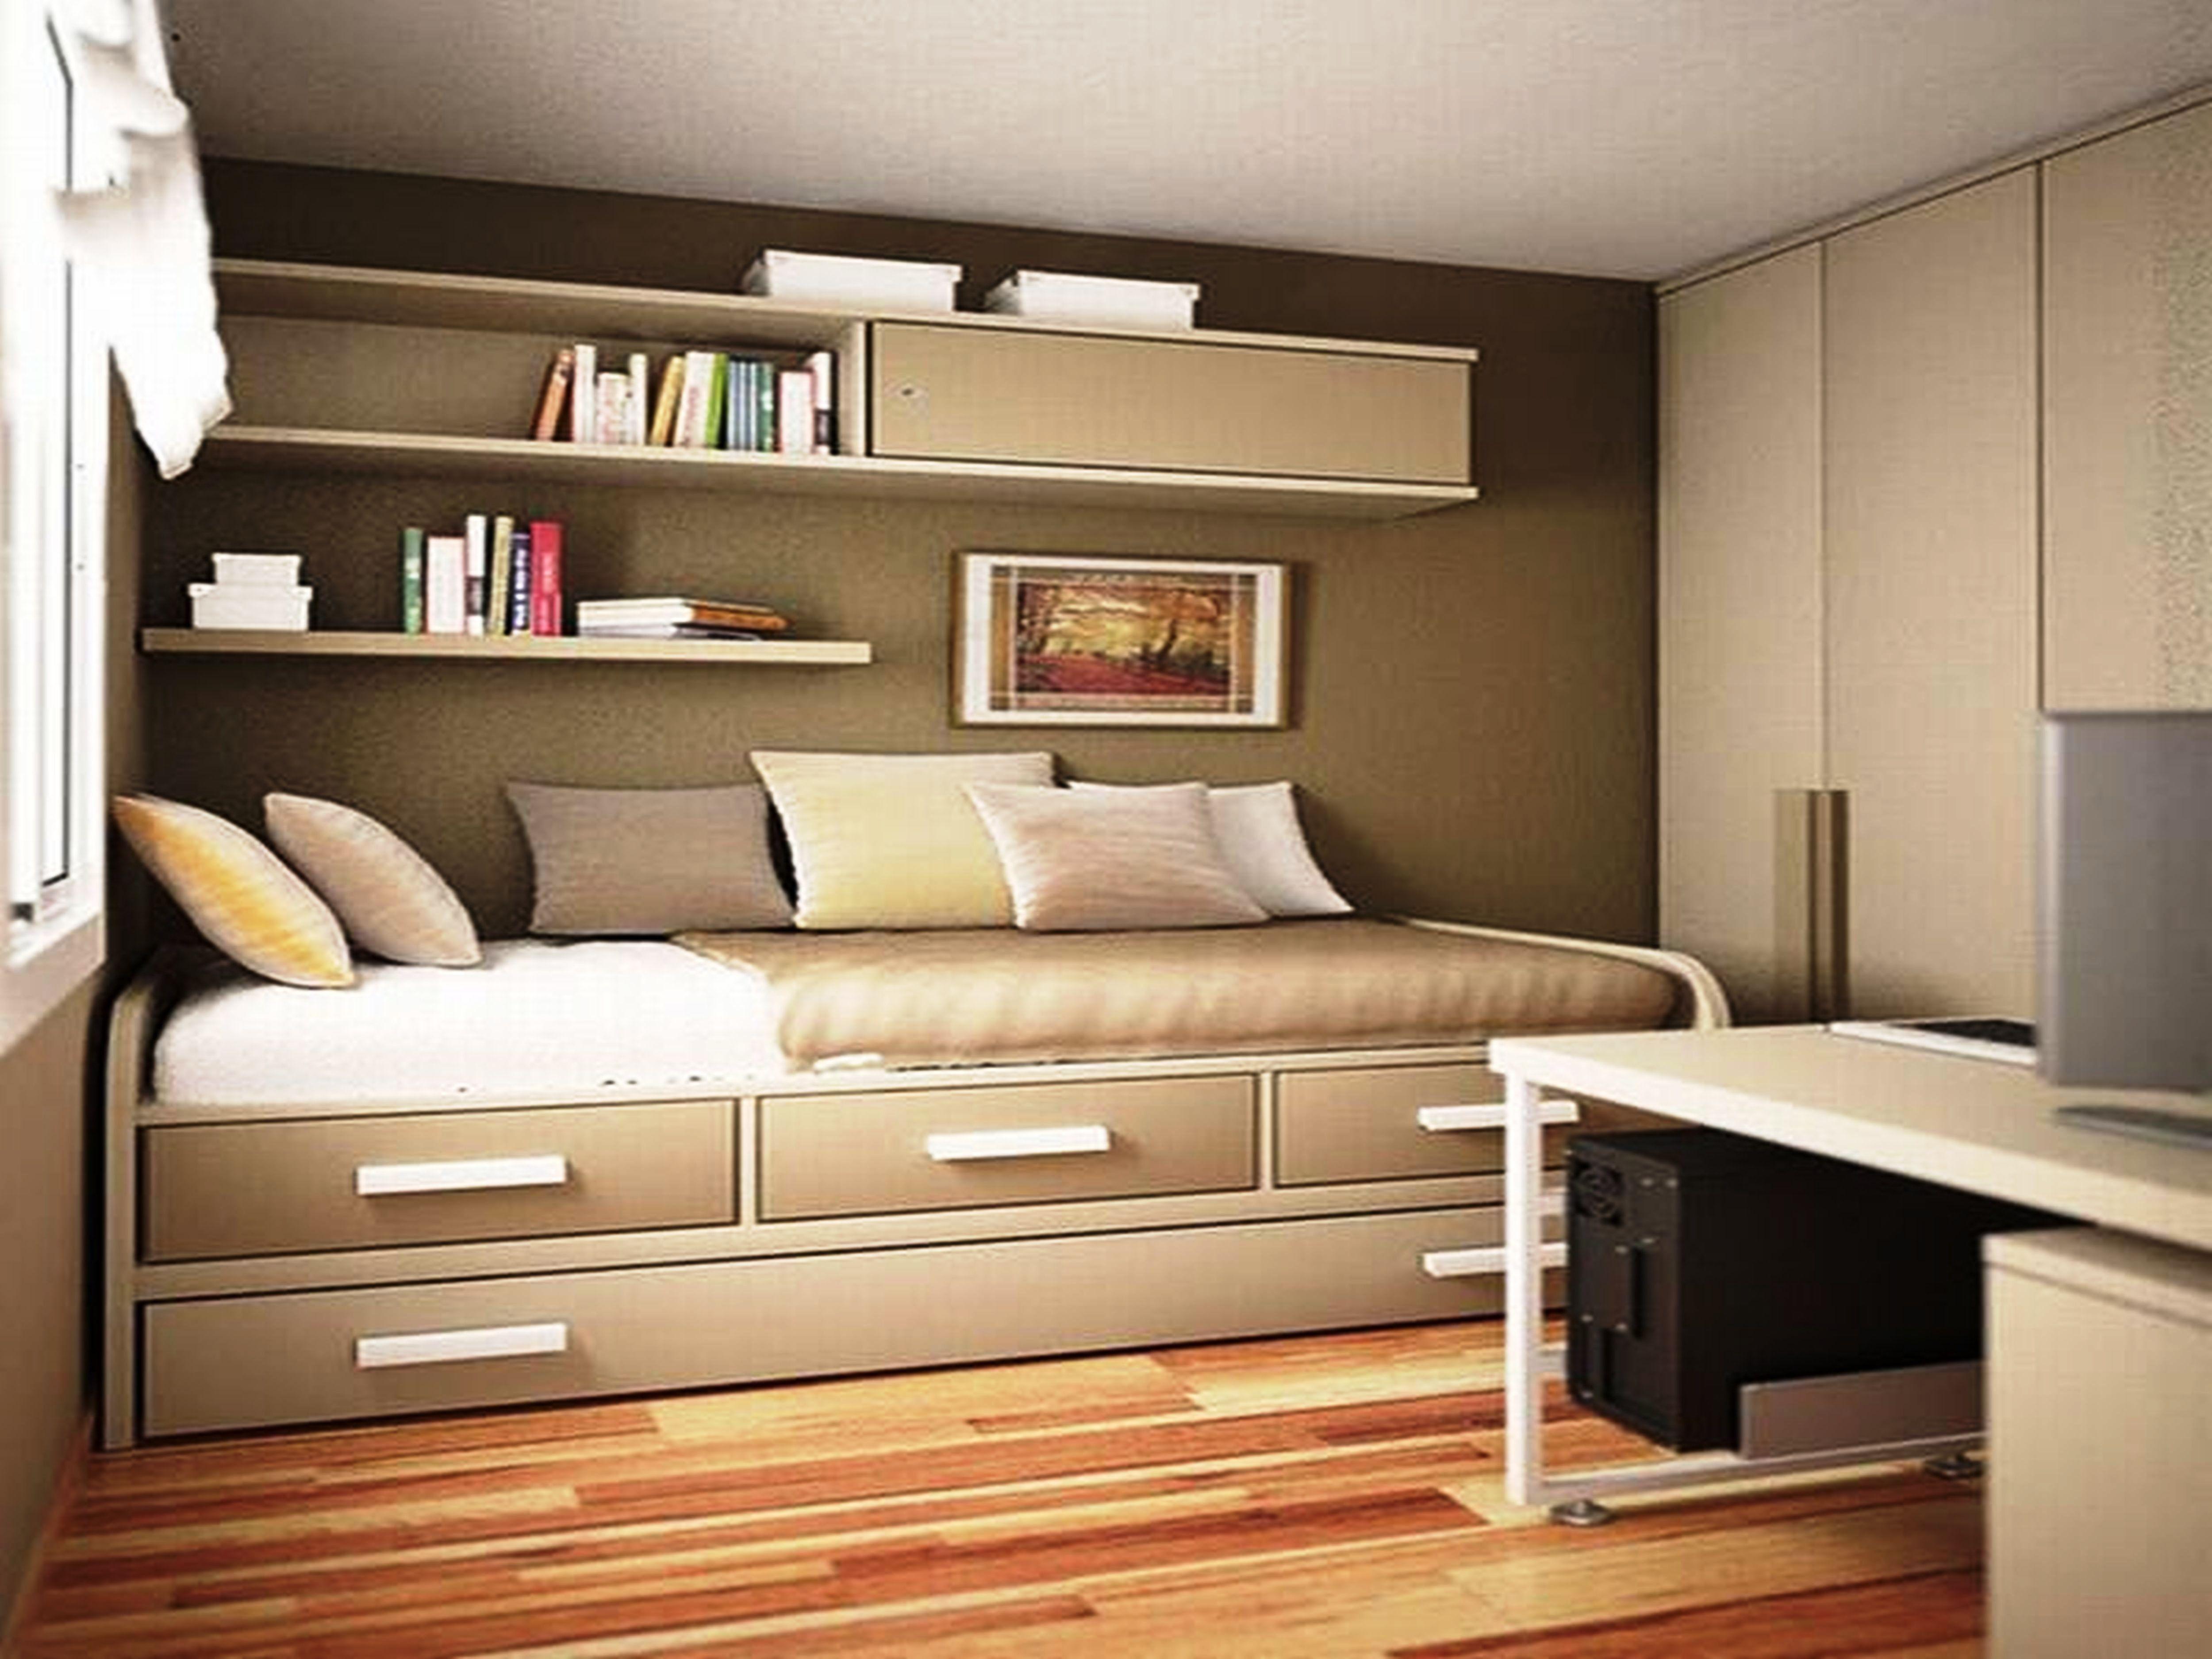 Sample bedroom designs, easy modern ikea small bedroom  ikea